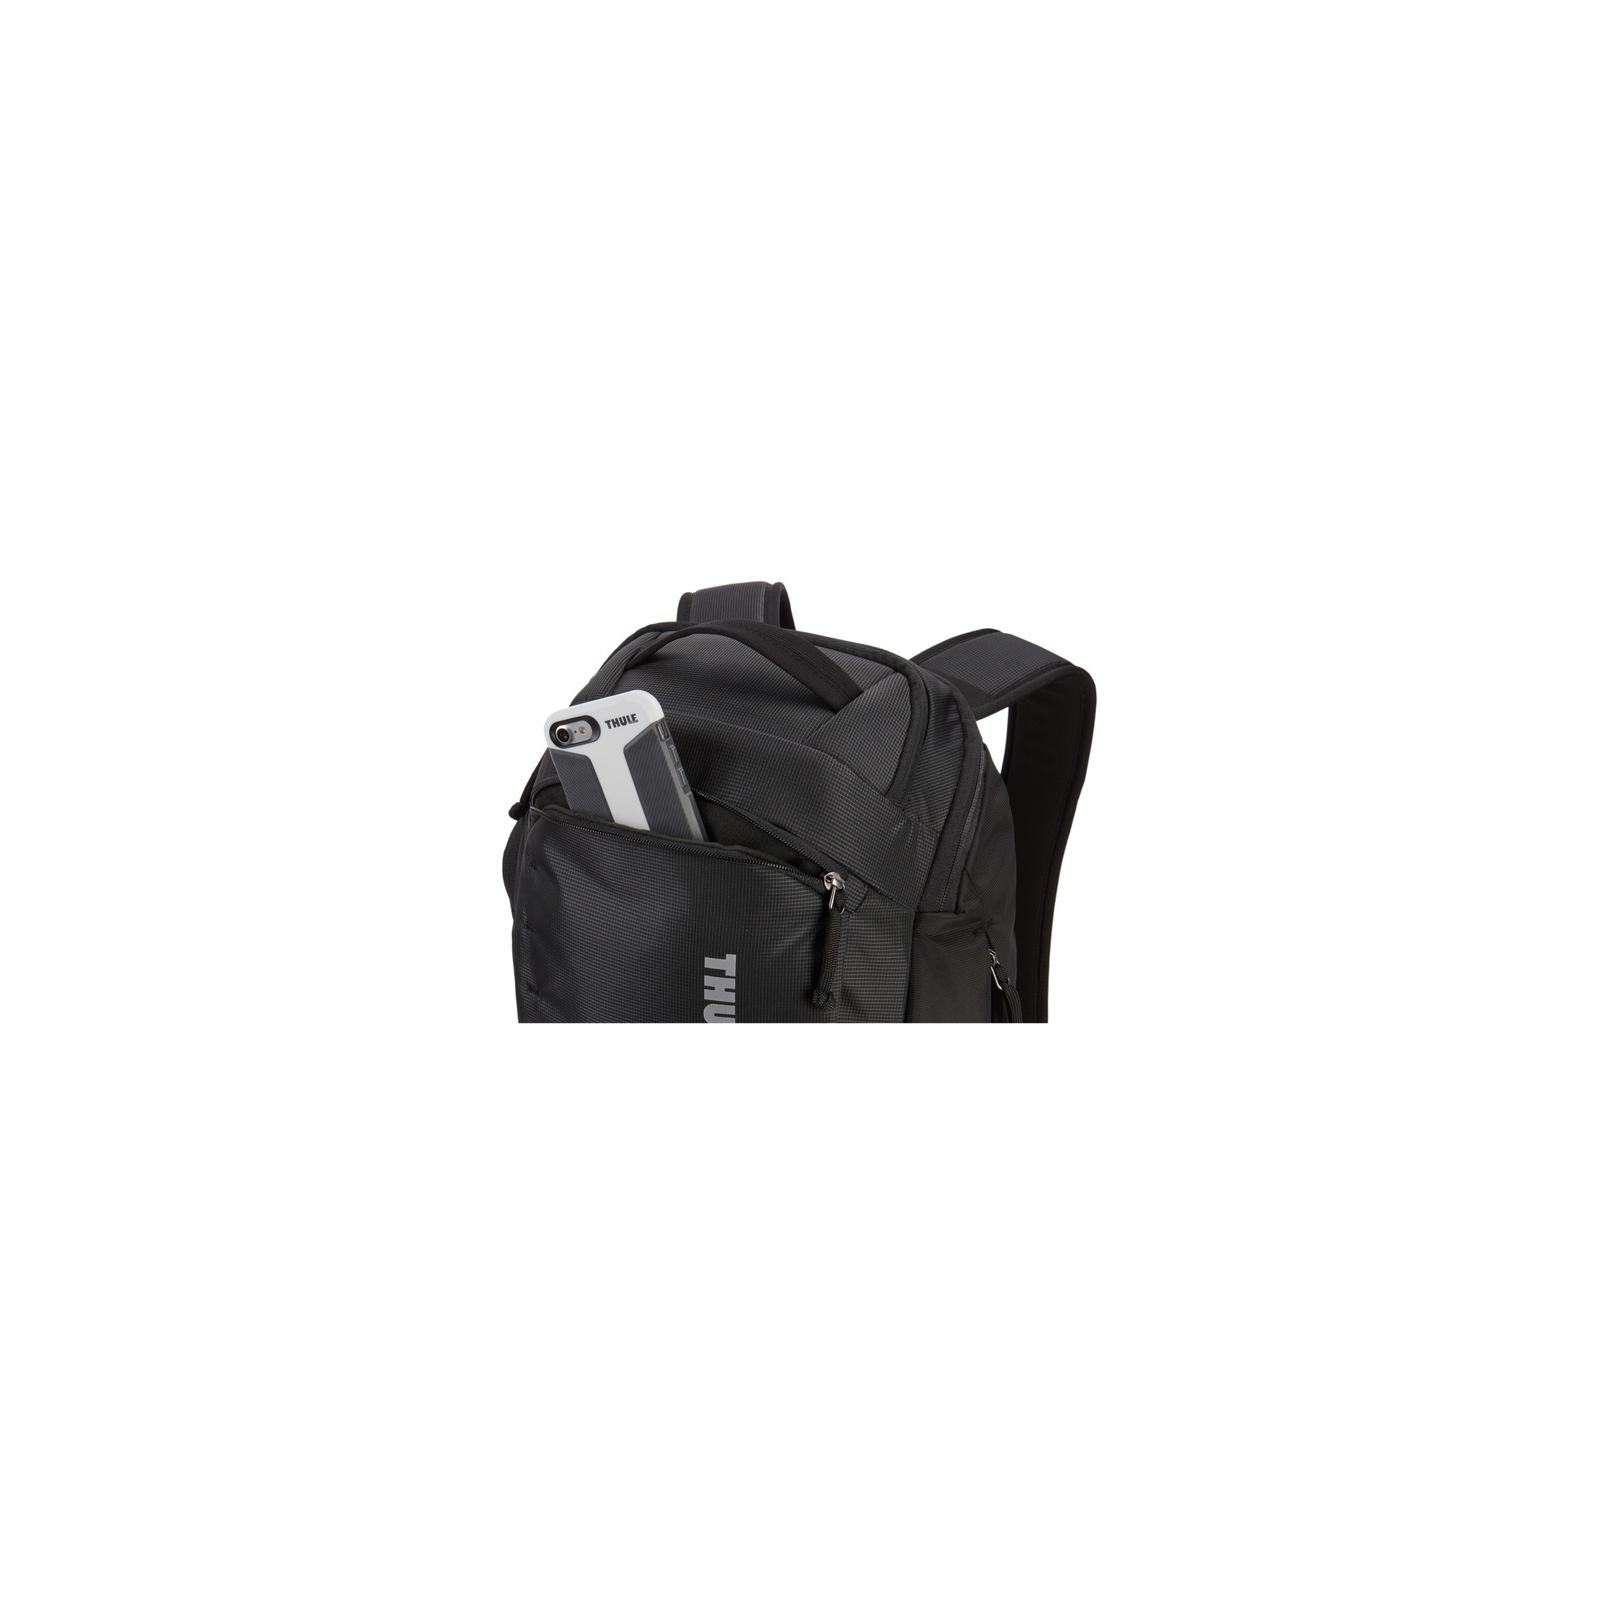 "Рюкзак для ноутбука Thule 15.6"" EnRoute 23L TEBP-316 Asphalt (3203830) изображение 7"